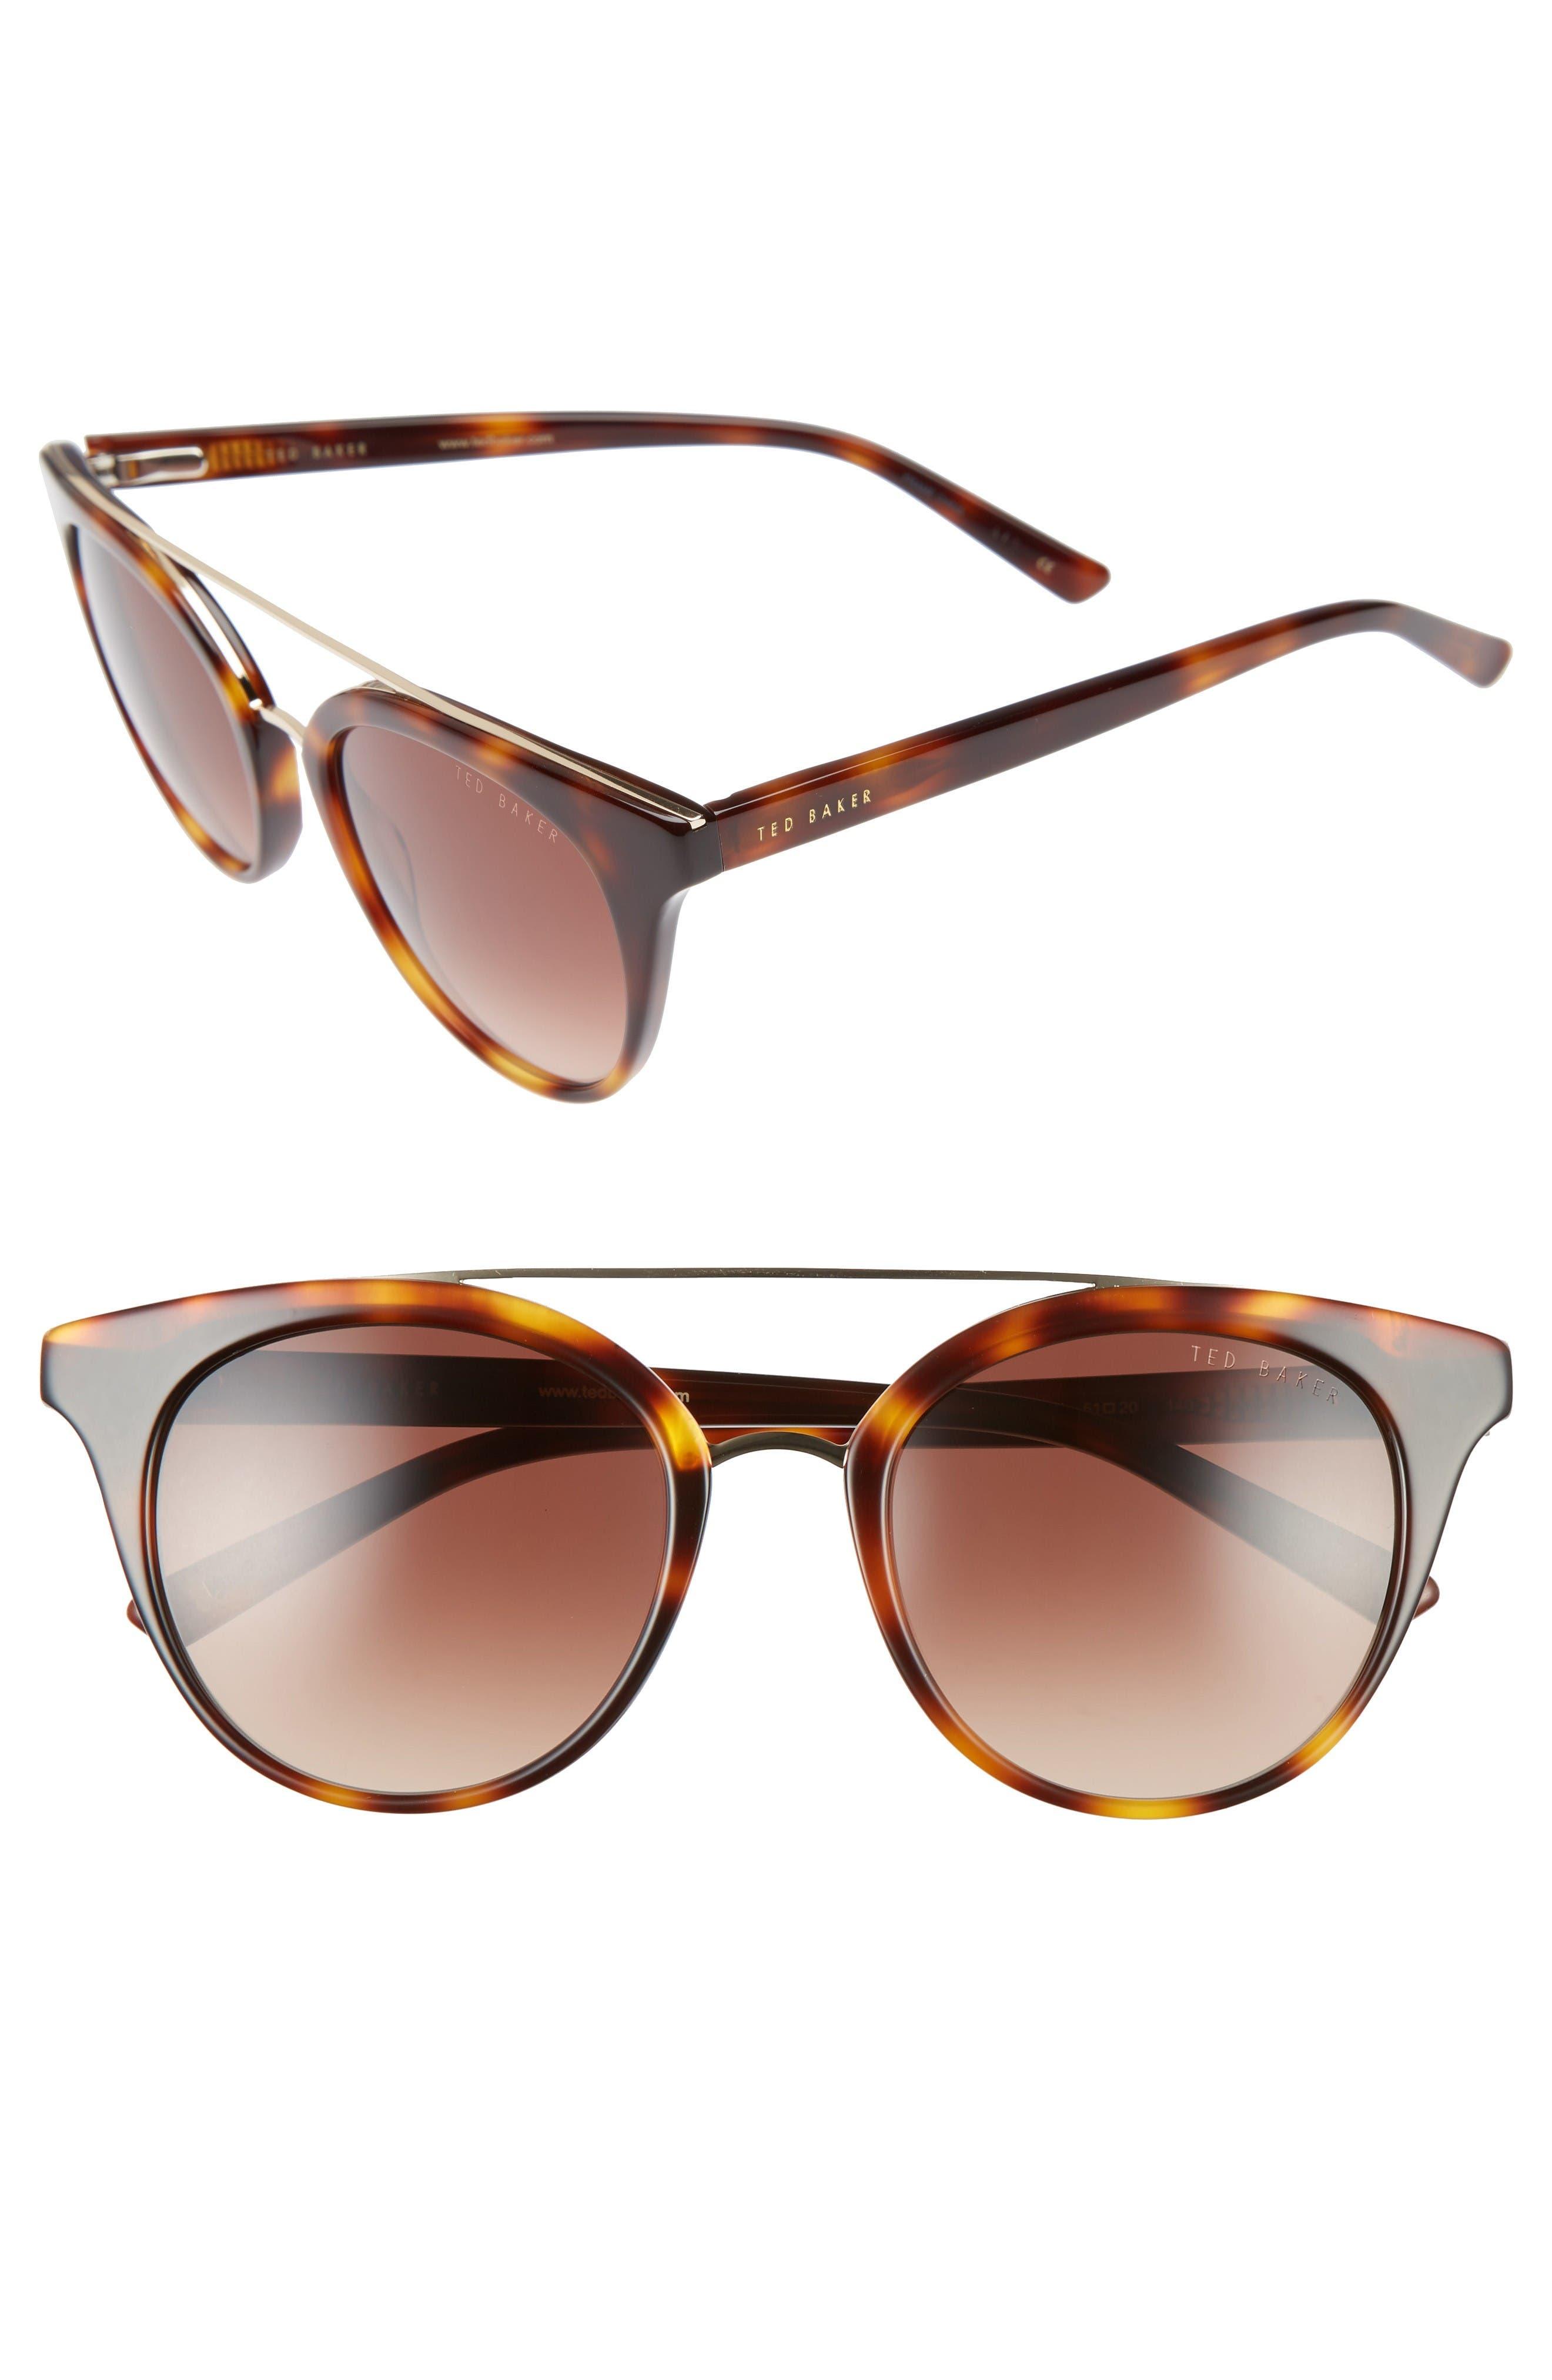 Alternate Image 1 Selected - Ted Baker London 51mm Gradient Lens Round Retro Sunglasses